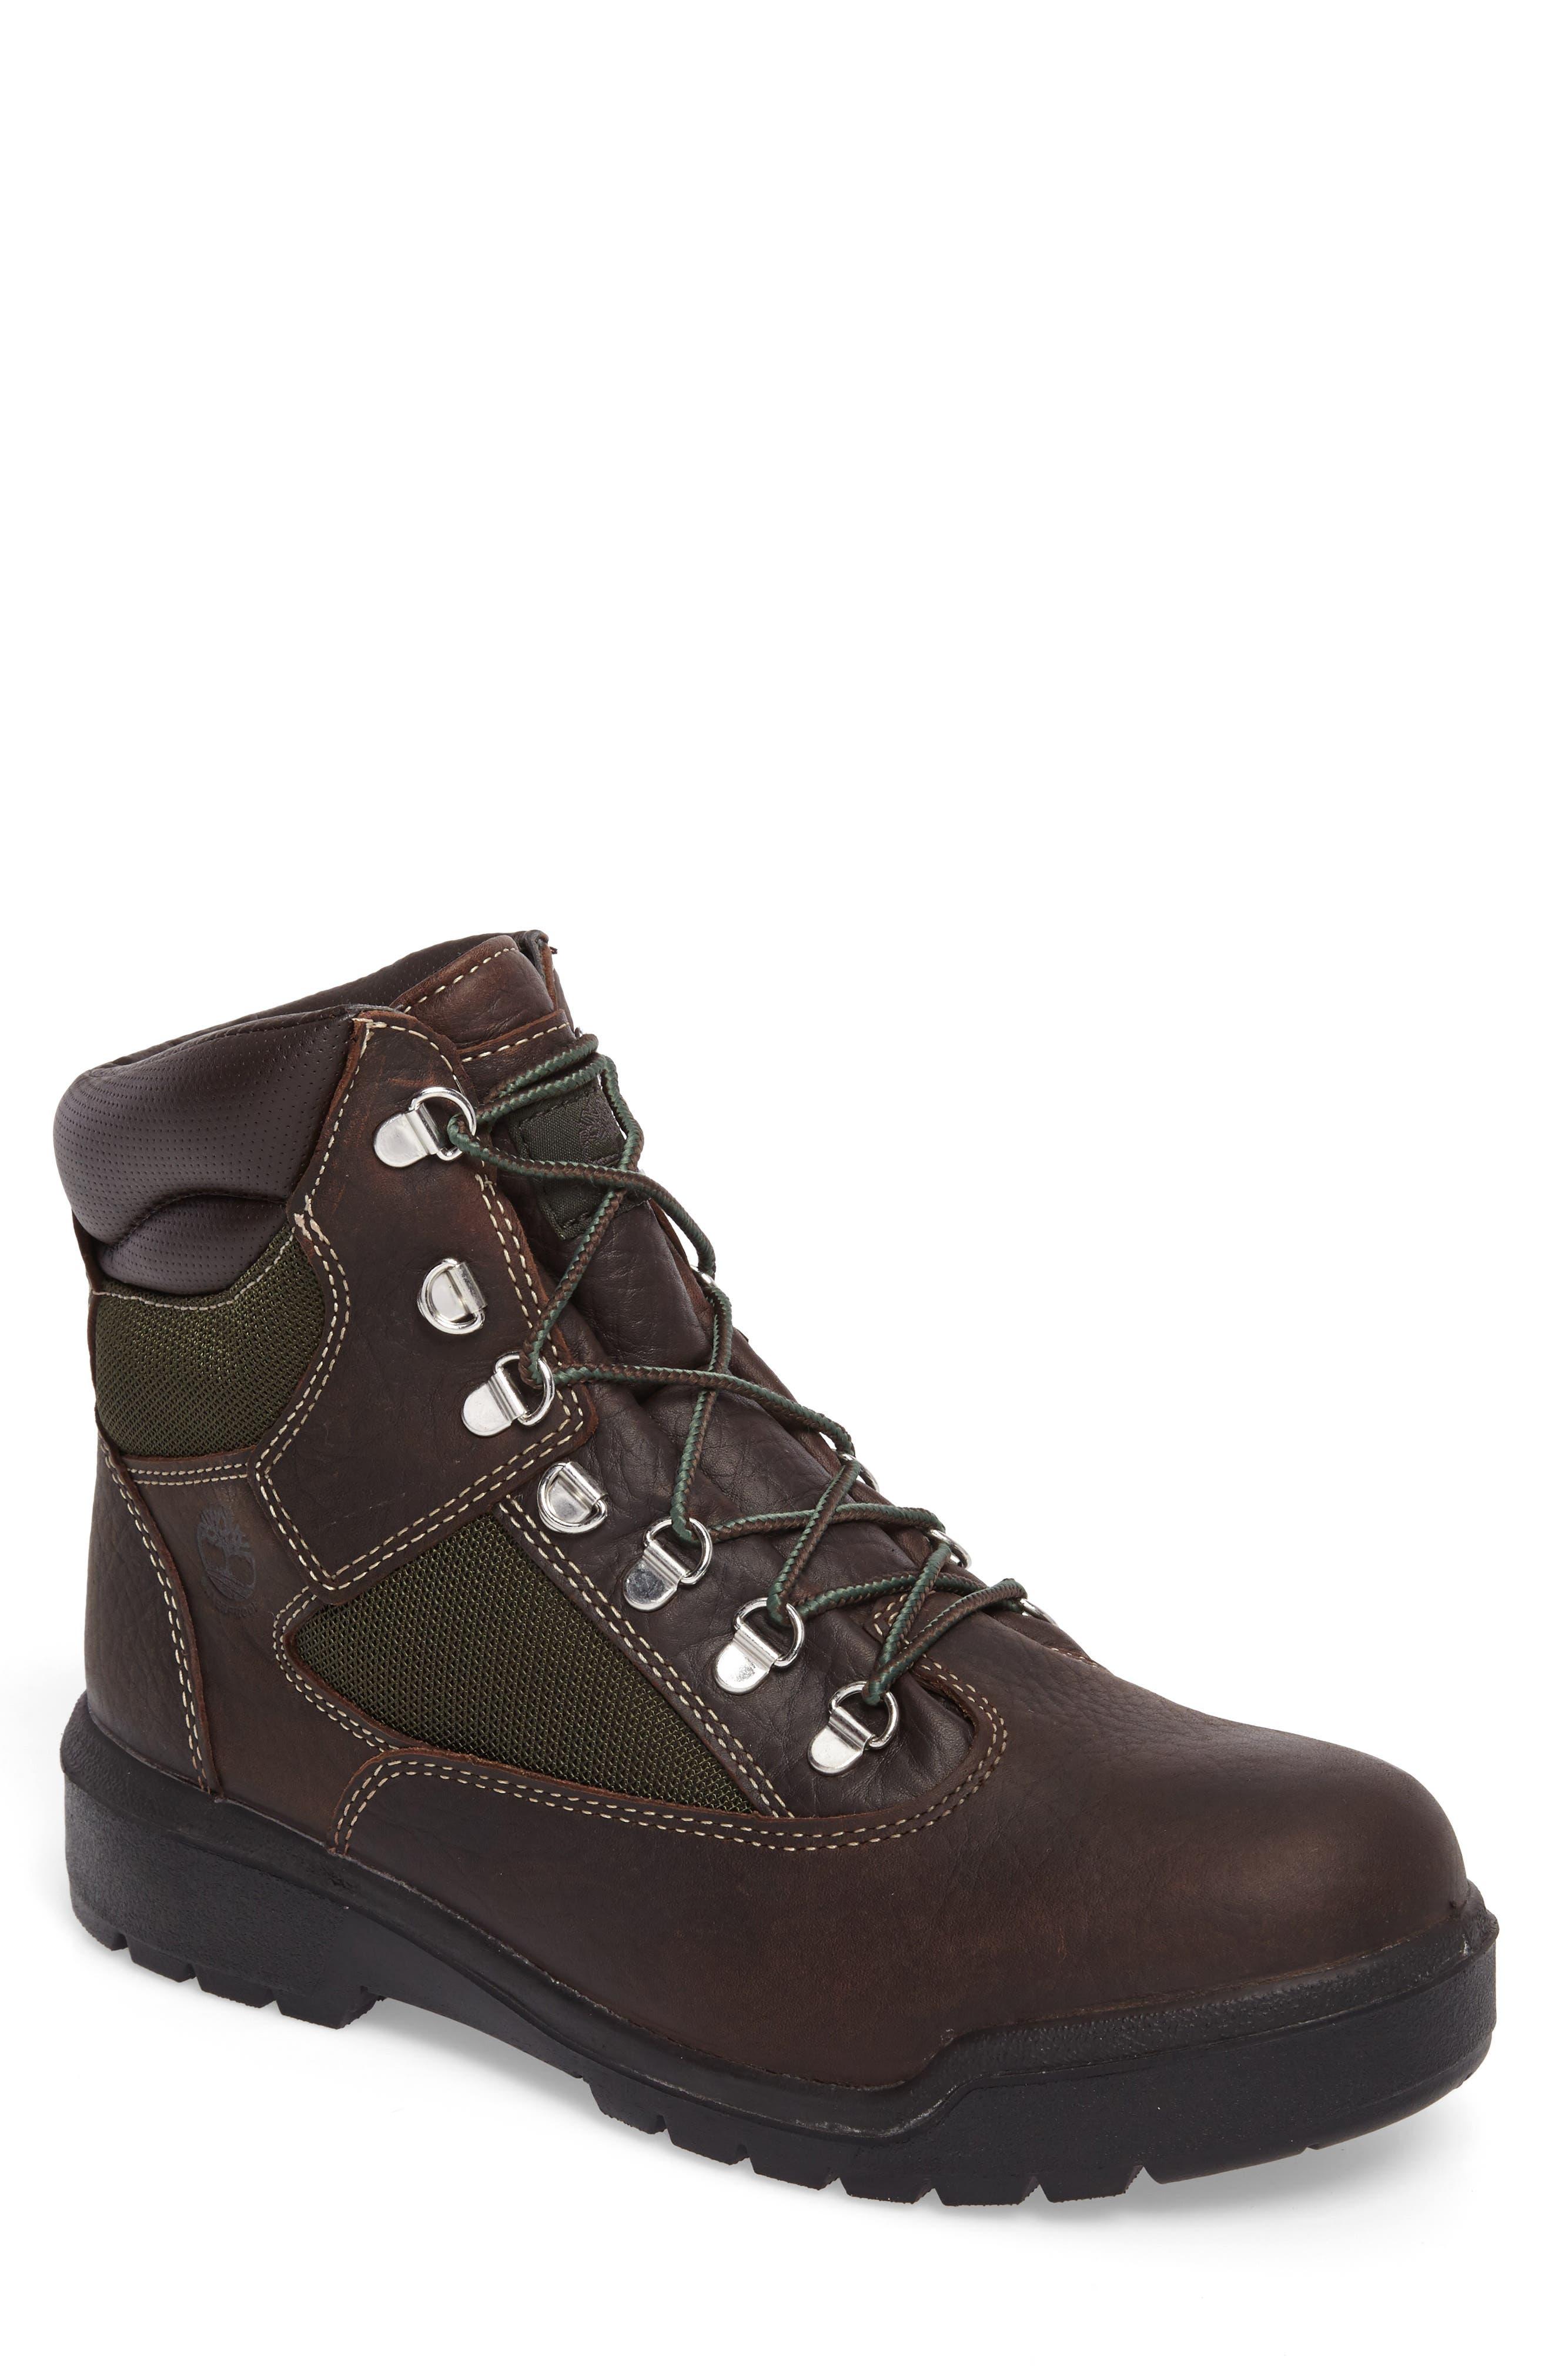 Field Waterproof Winter Boot,                             Main thumbnail 1, color,                             Hazel Highway Leather